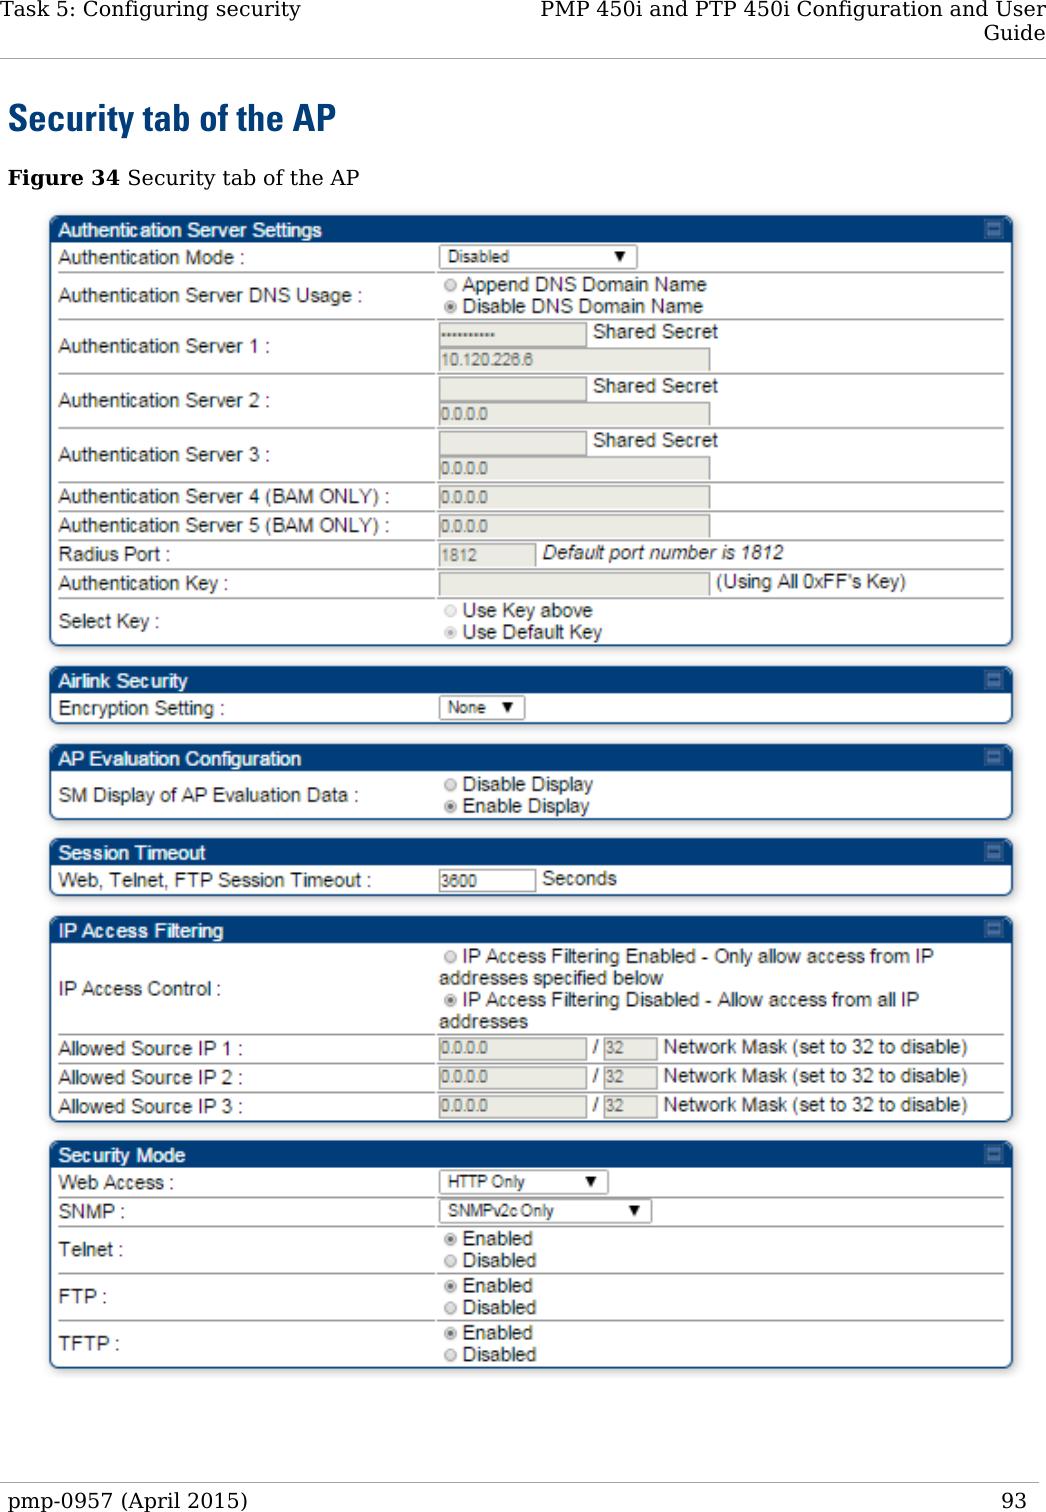 Cambium Networks 50450I Wireless Ethernet Bridge, Dual Channel OFDM